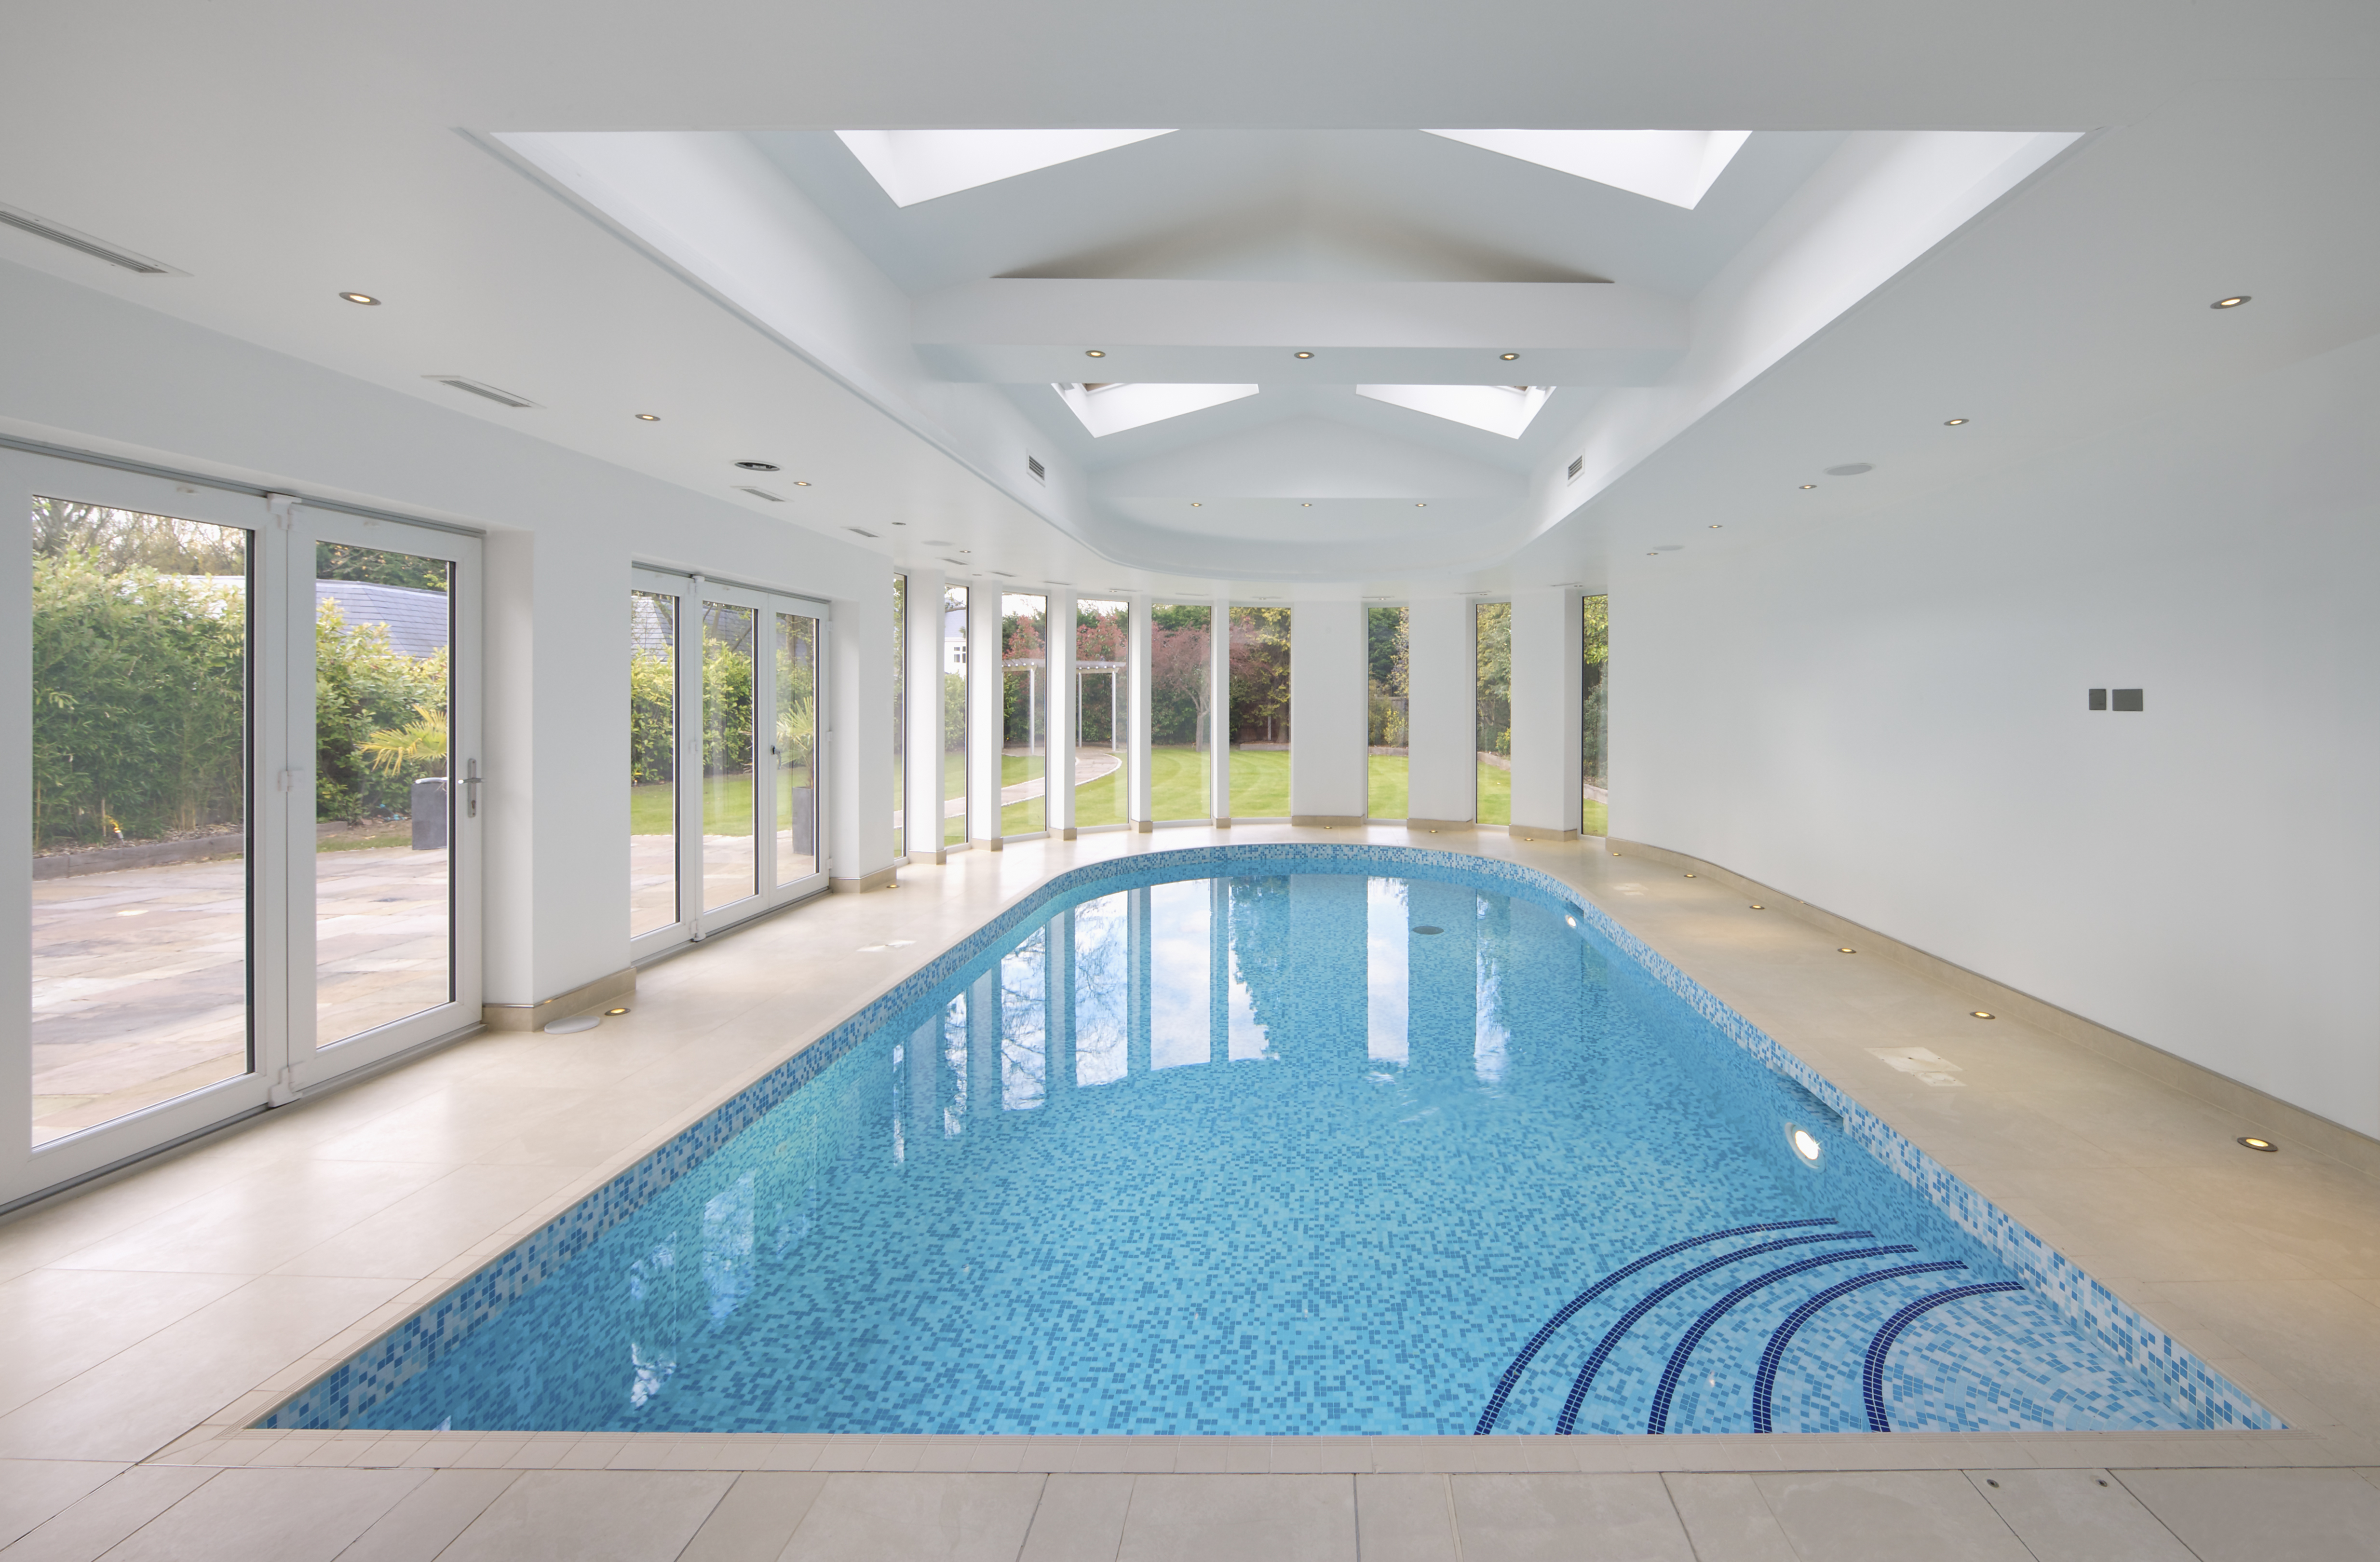 Indoor swimming pool in patio setting